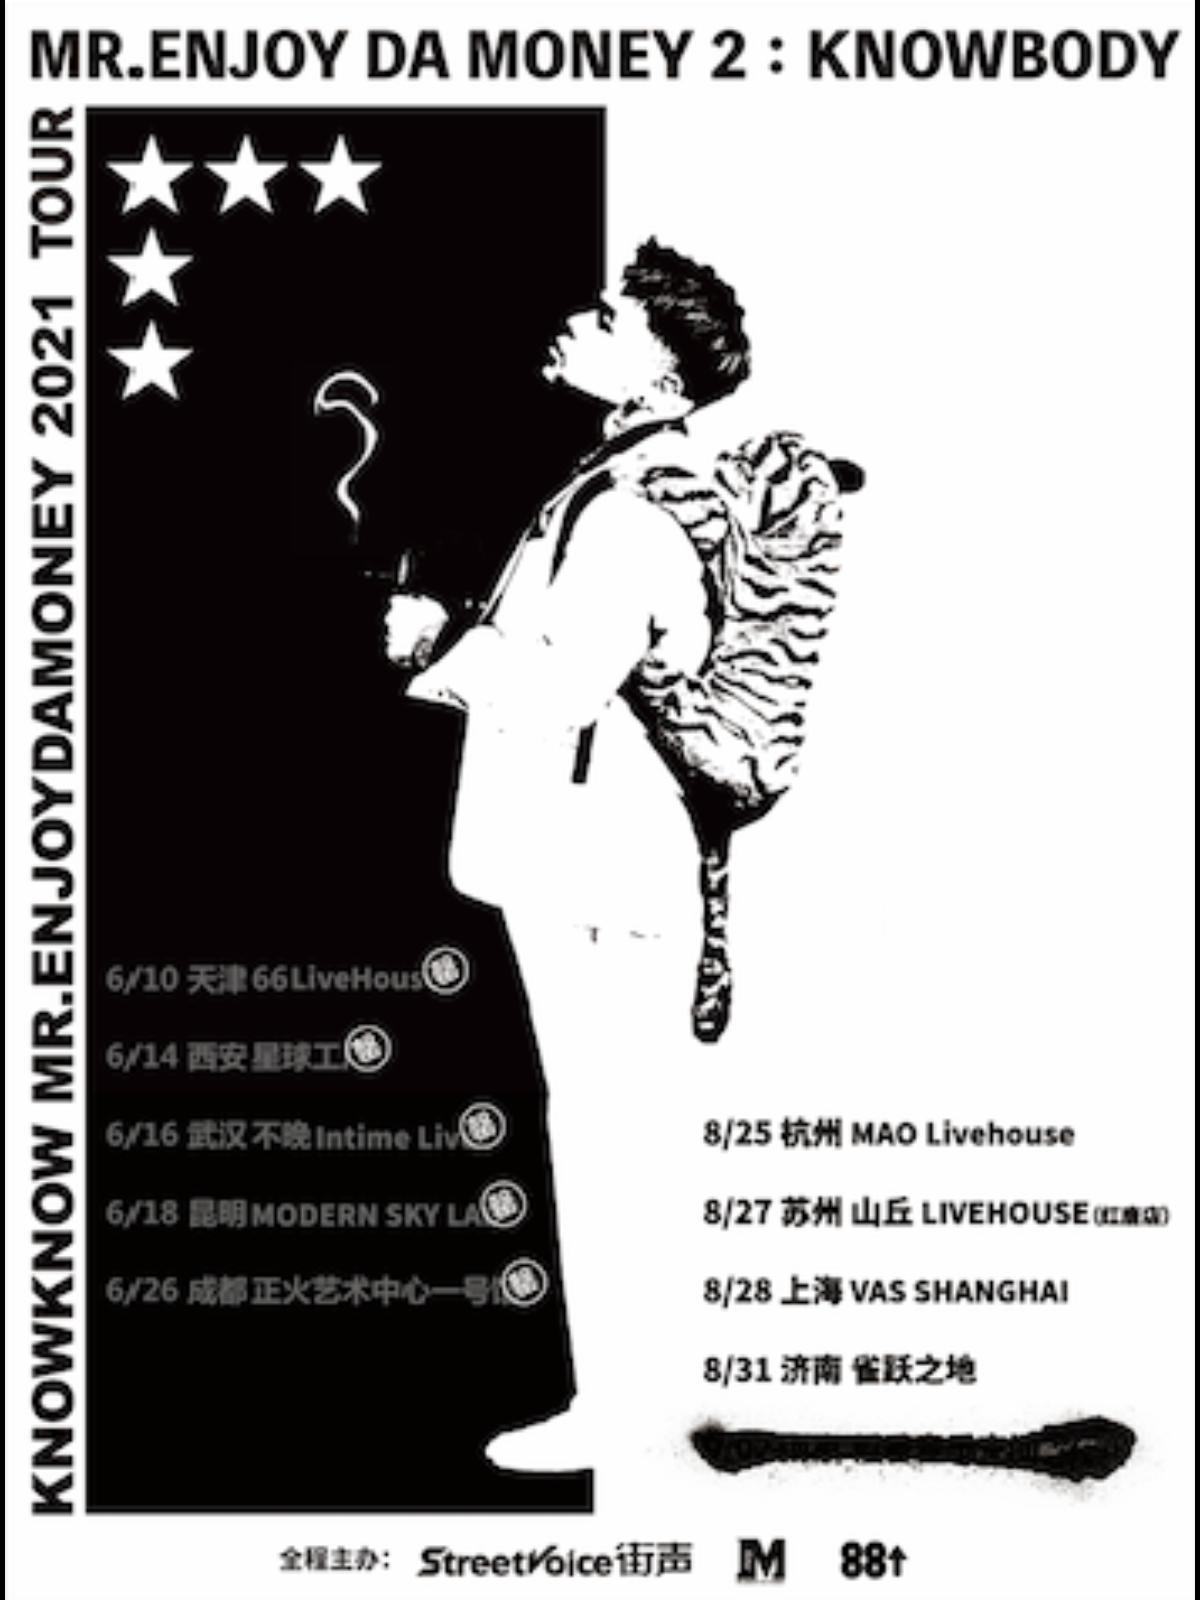 【延期】KnowKnow TOUR